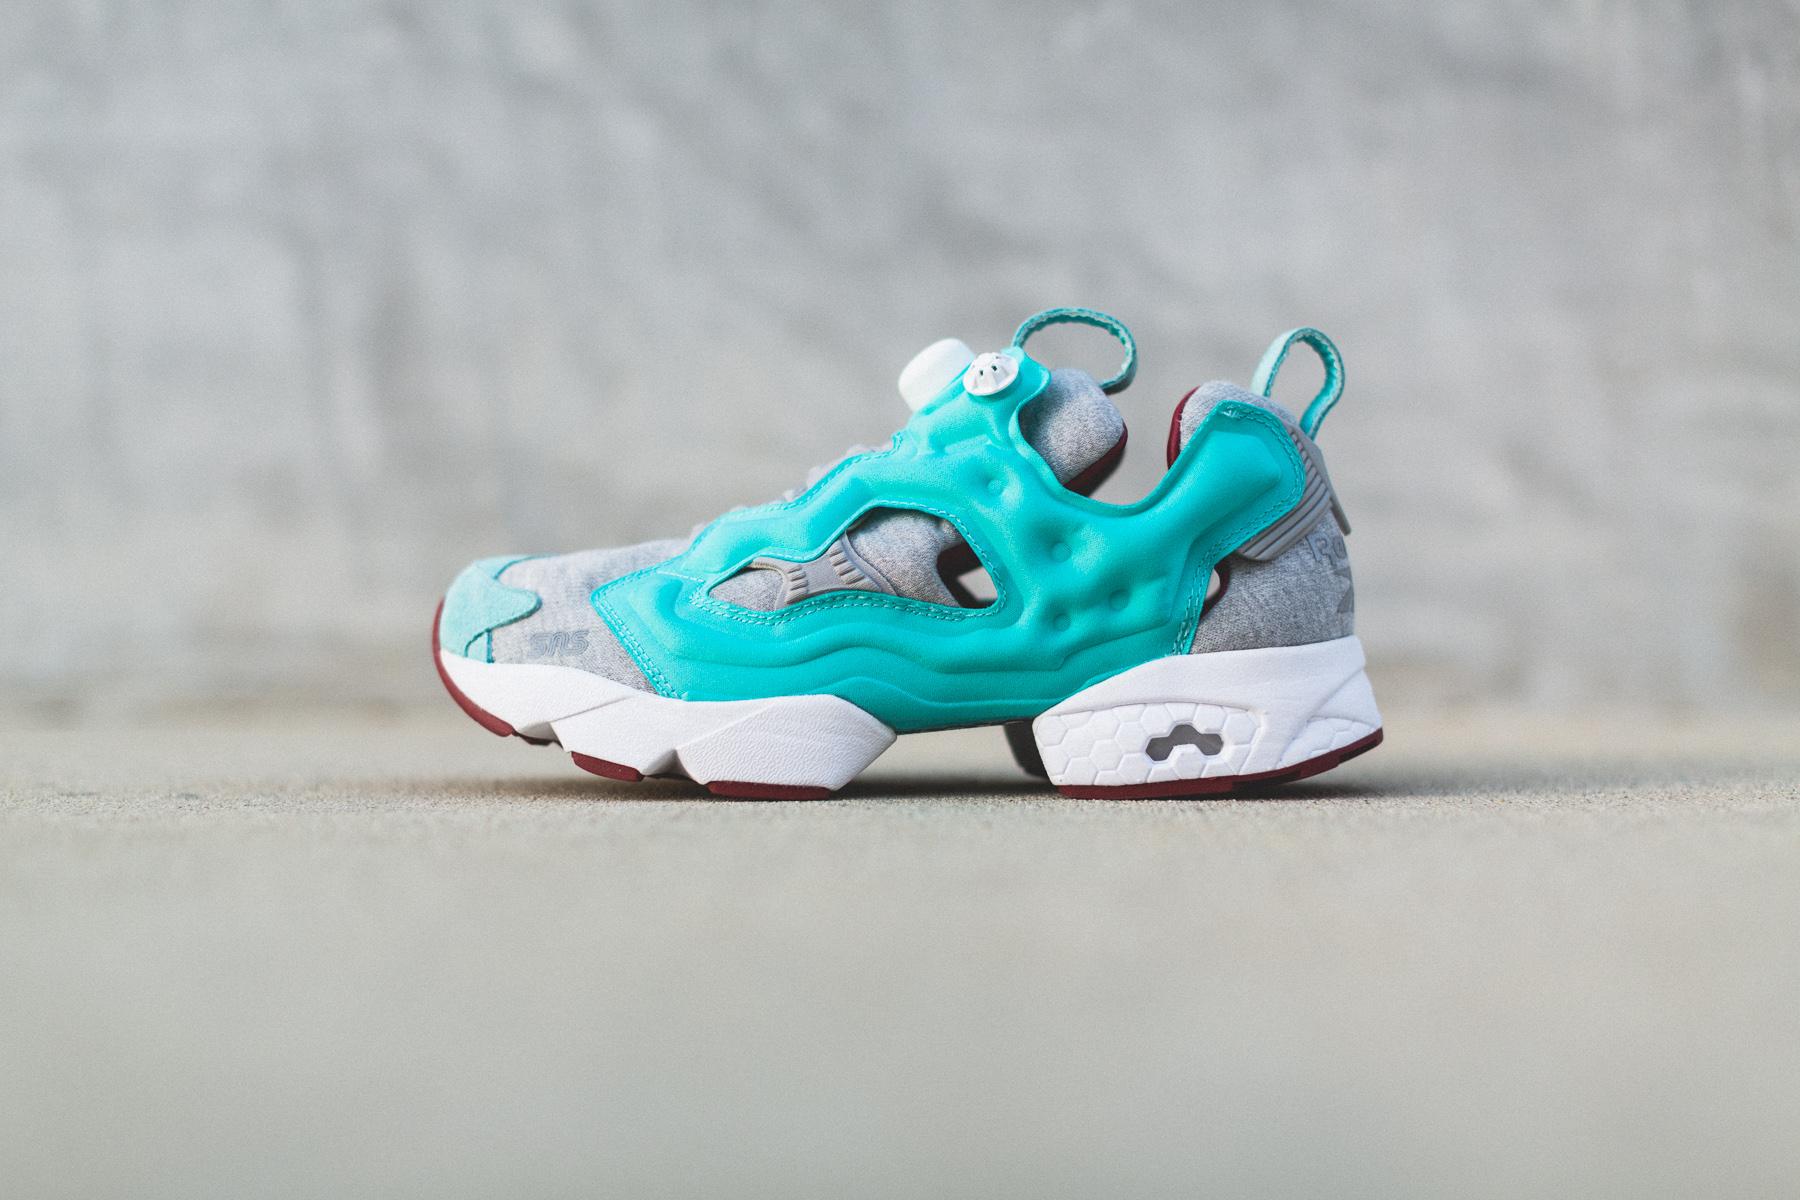 Sneakersnstuff x Reebok Instapump Fury 20th Anniversary